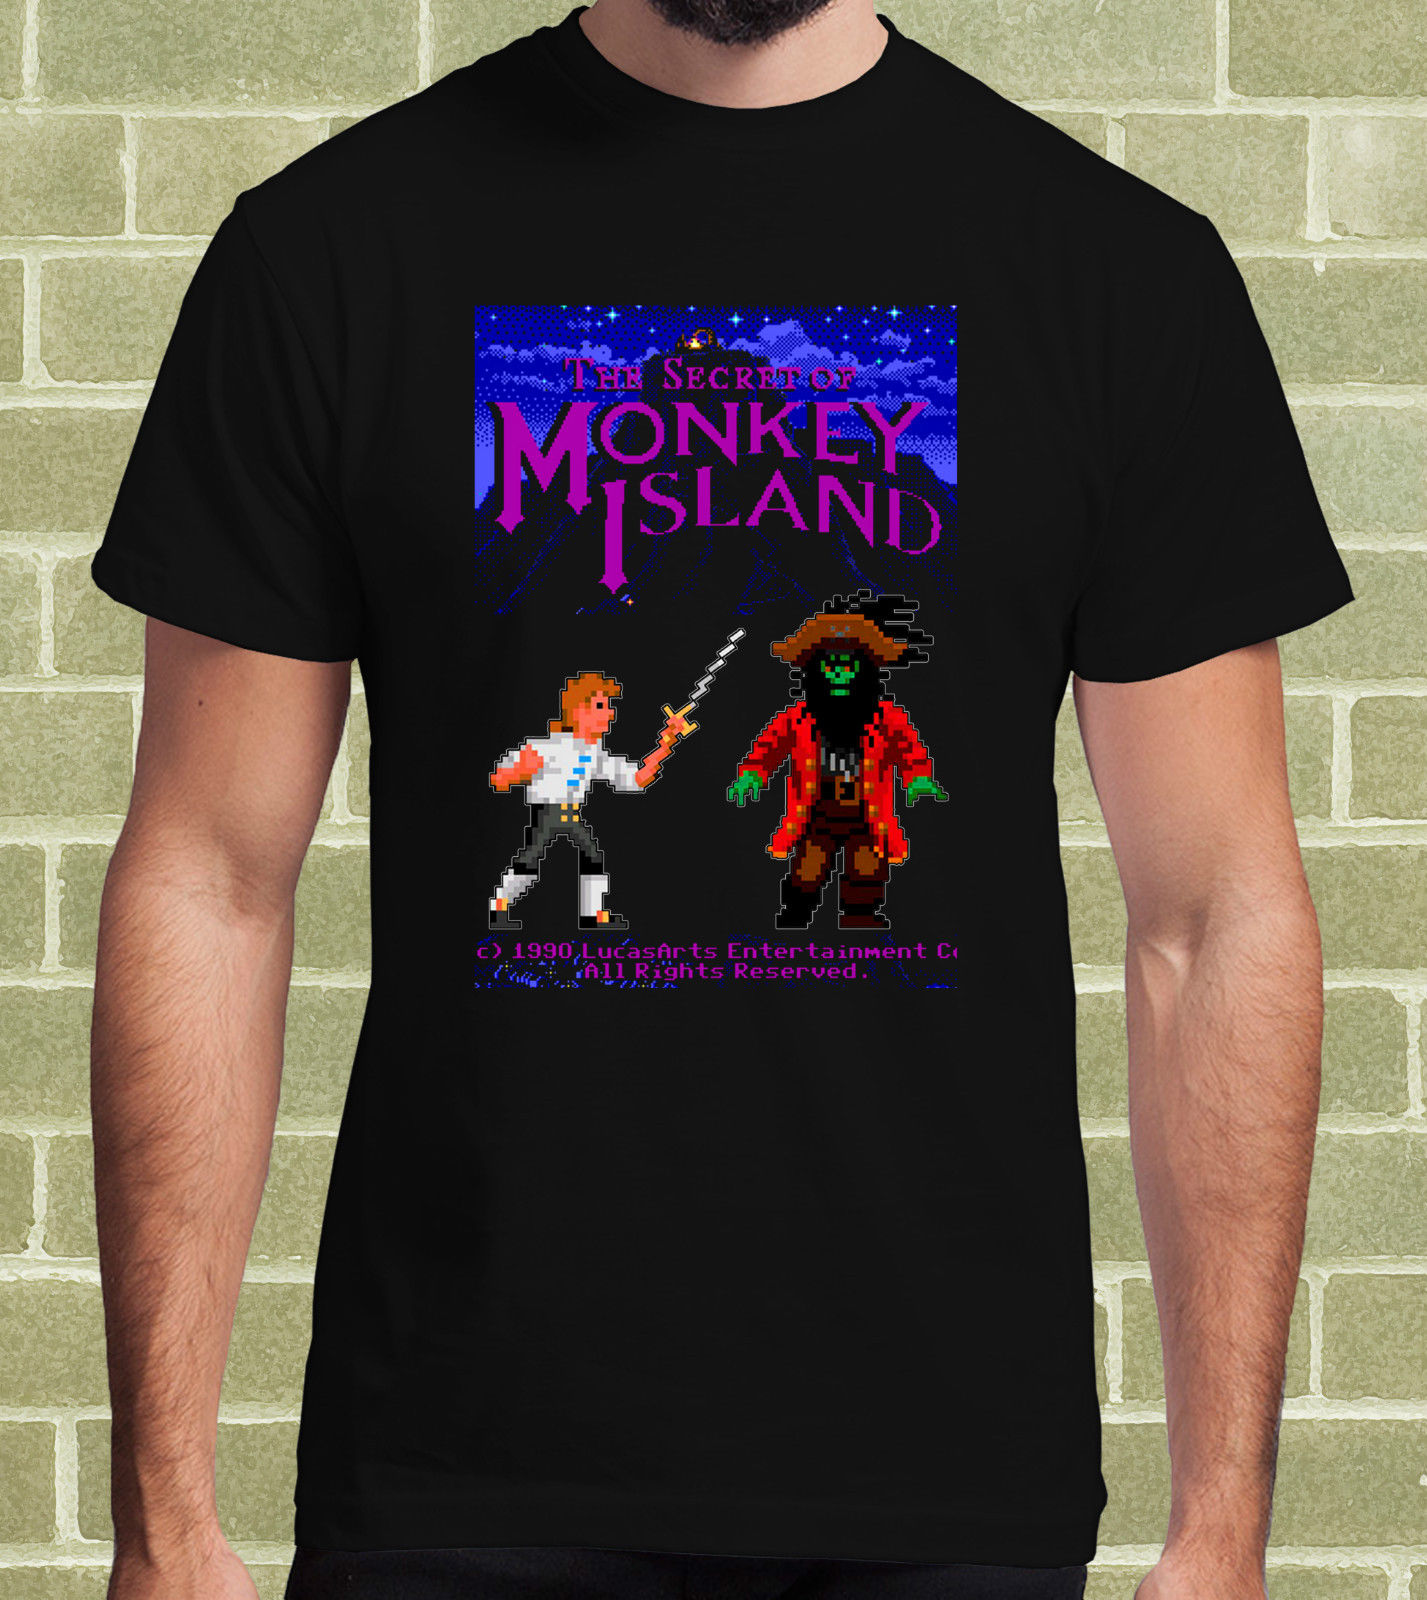 gildan-monkey-island-fontbvideogame-b-font-arcade-1990-t-shirt-per-uomo-e-bambino-mens-t-shirt